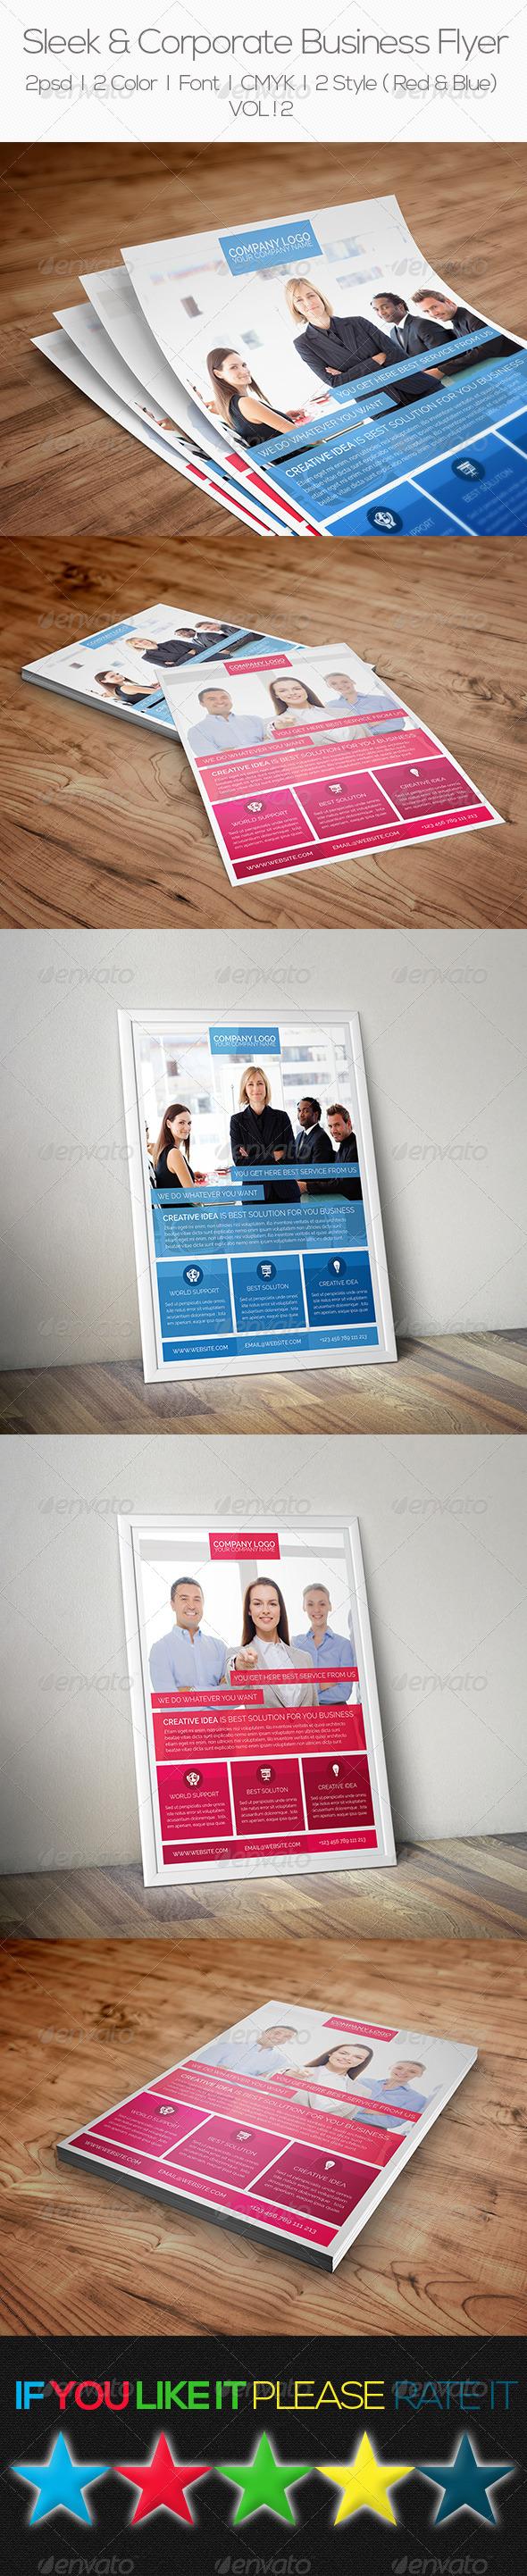 Sleek & Corporate Business Flyer - Corporate Flyers